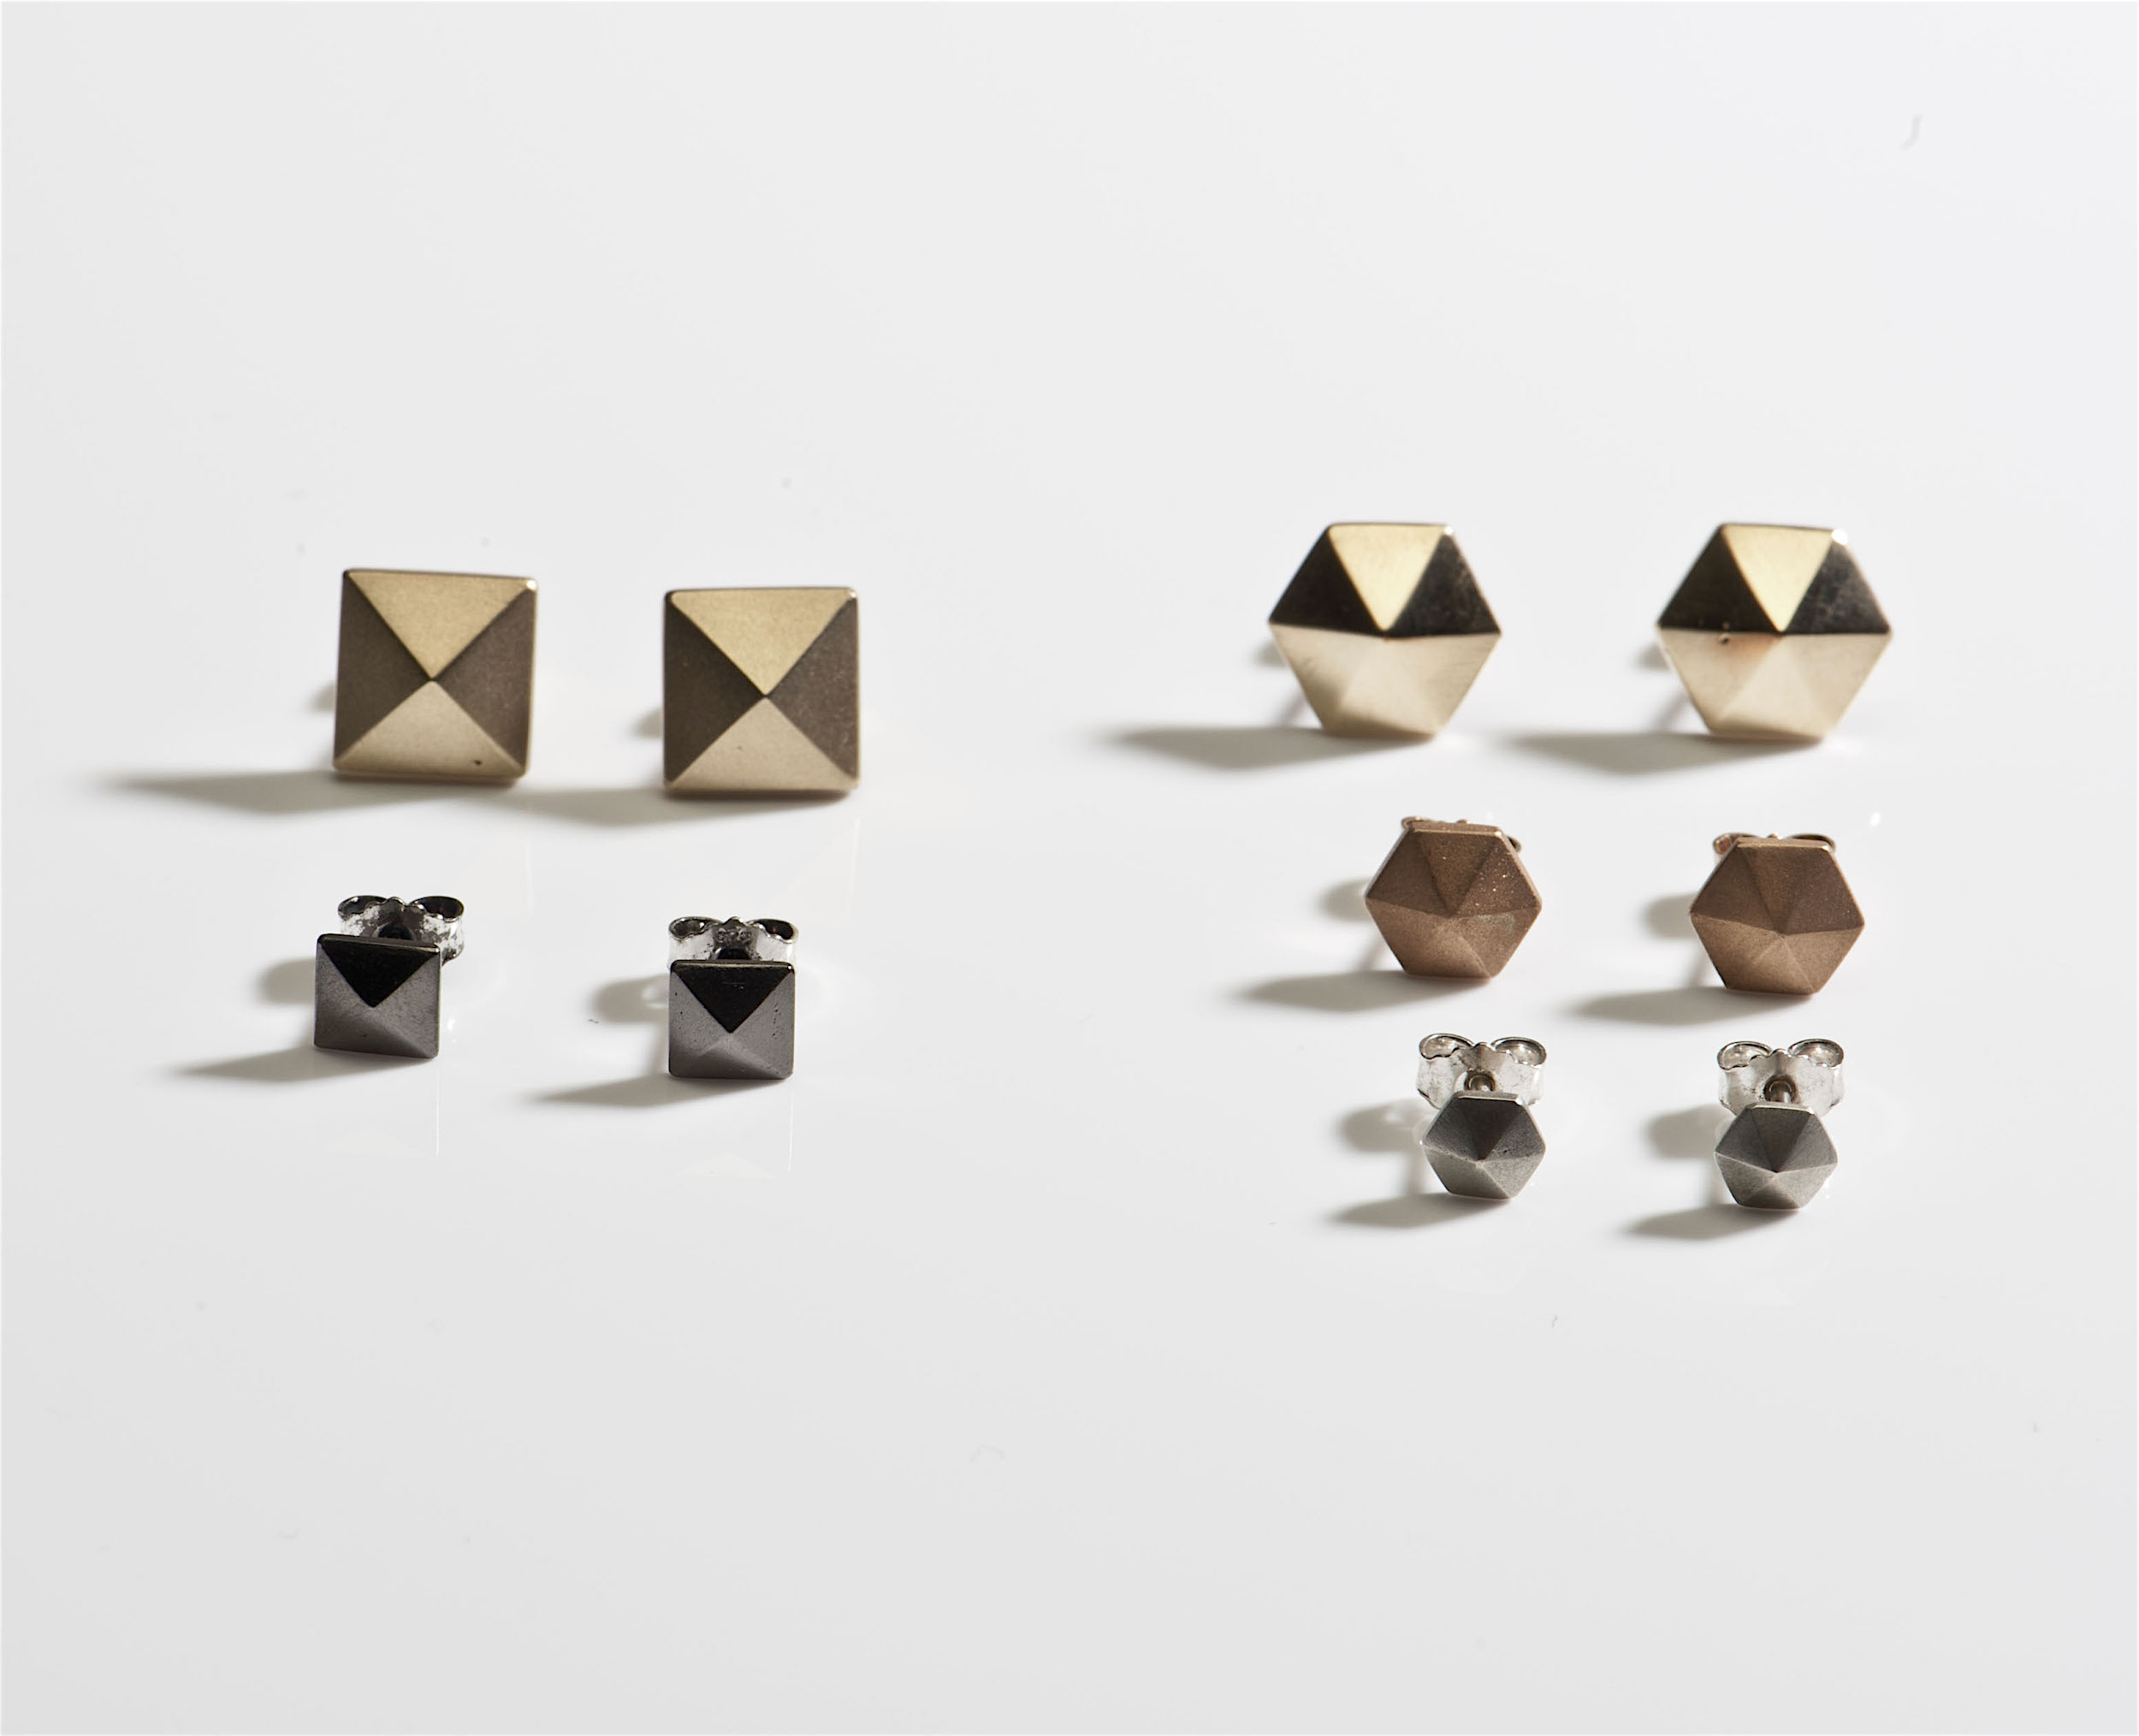 pyramid stud earrings silver gold plated black jewellery.jpg